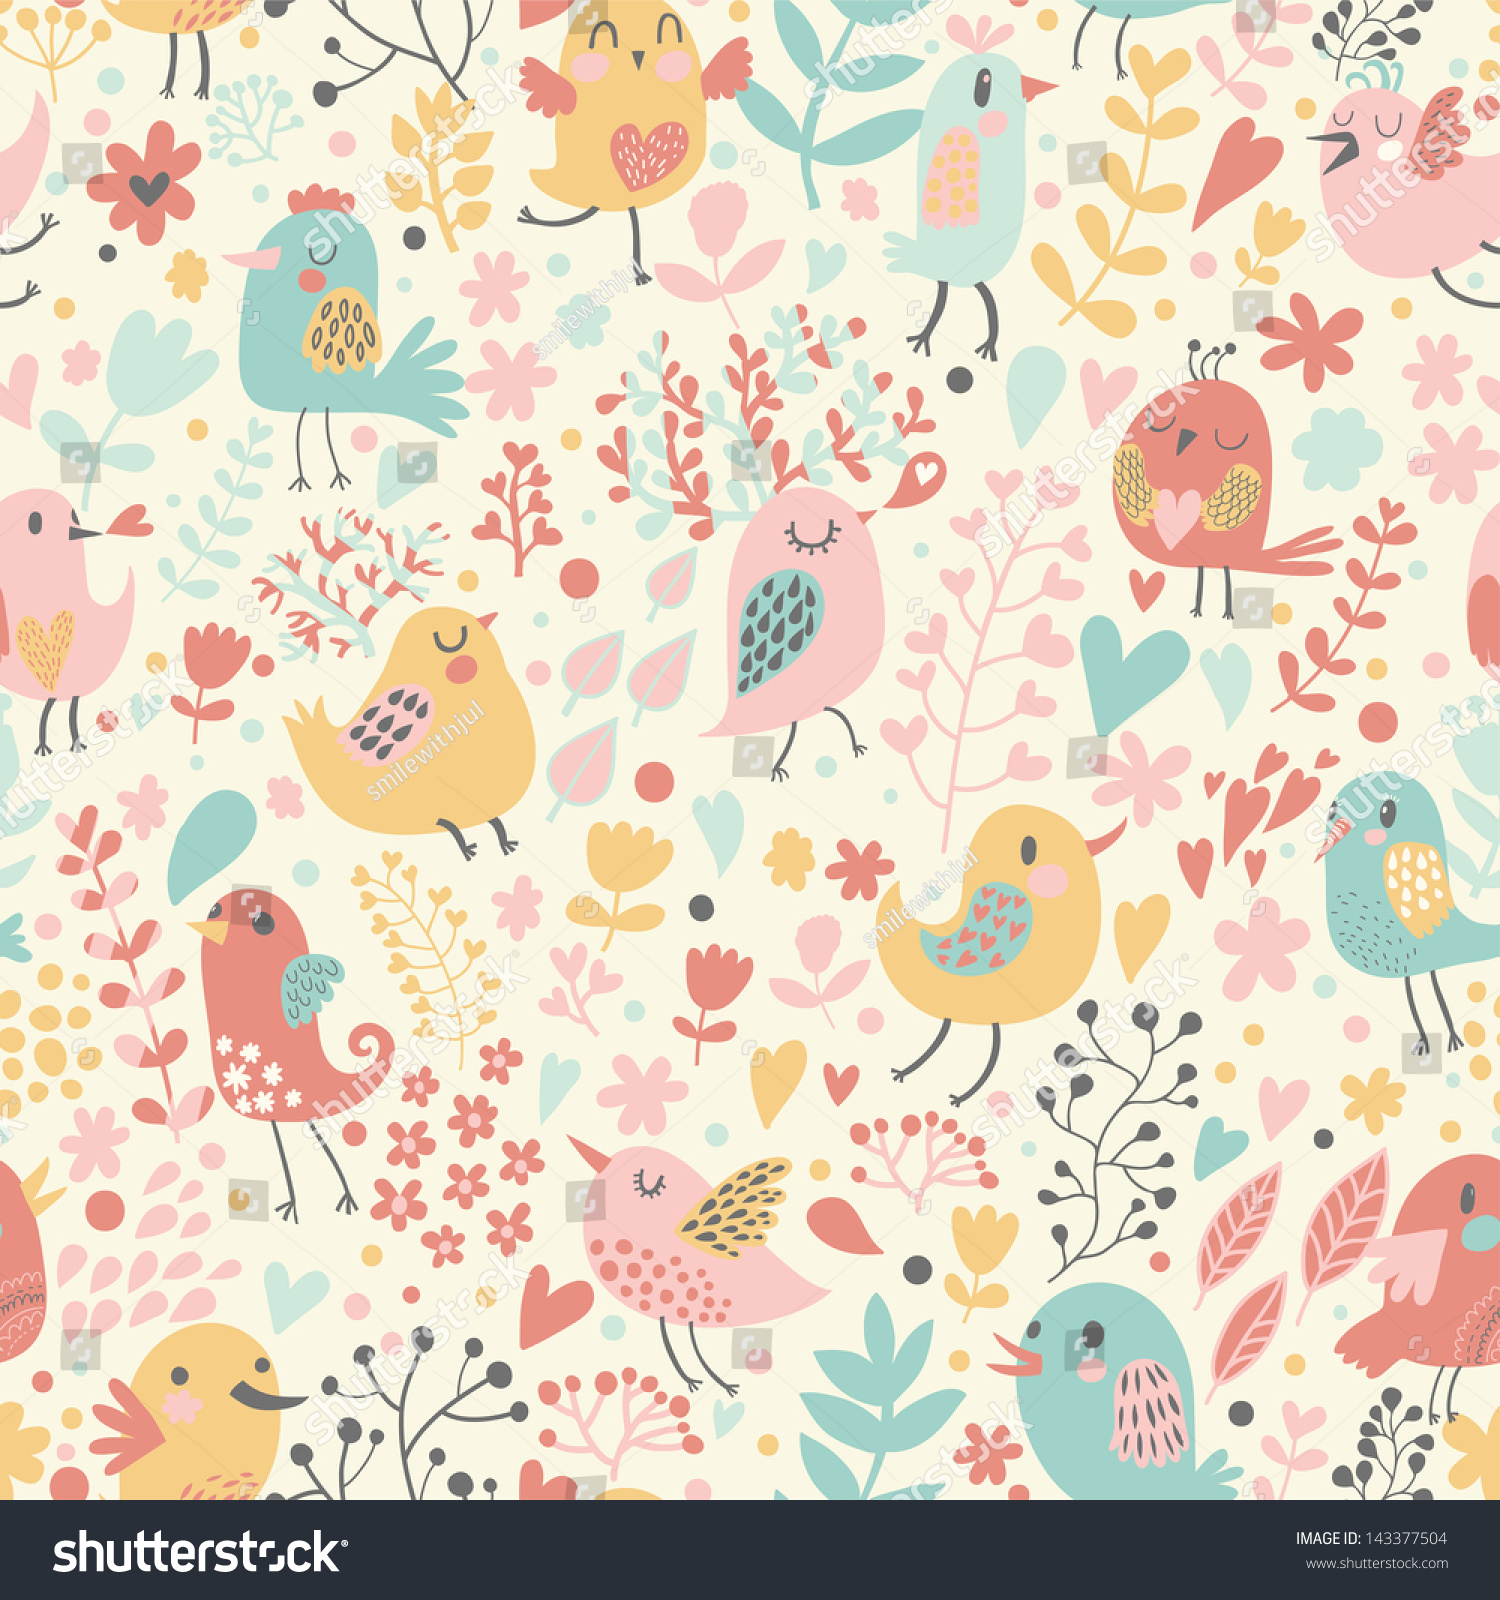 cute spring flower backgrounds wwwpixsharkcom images